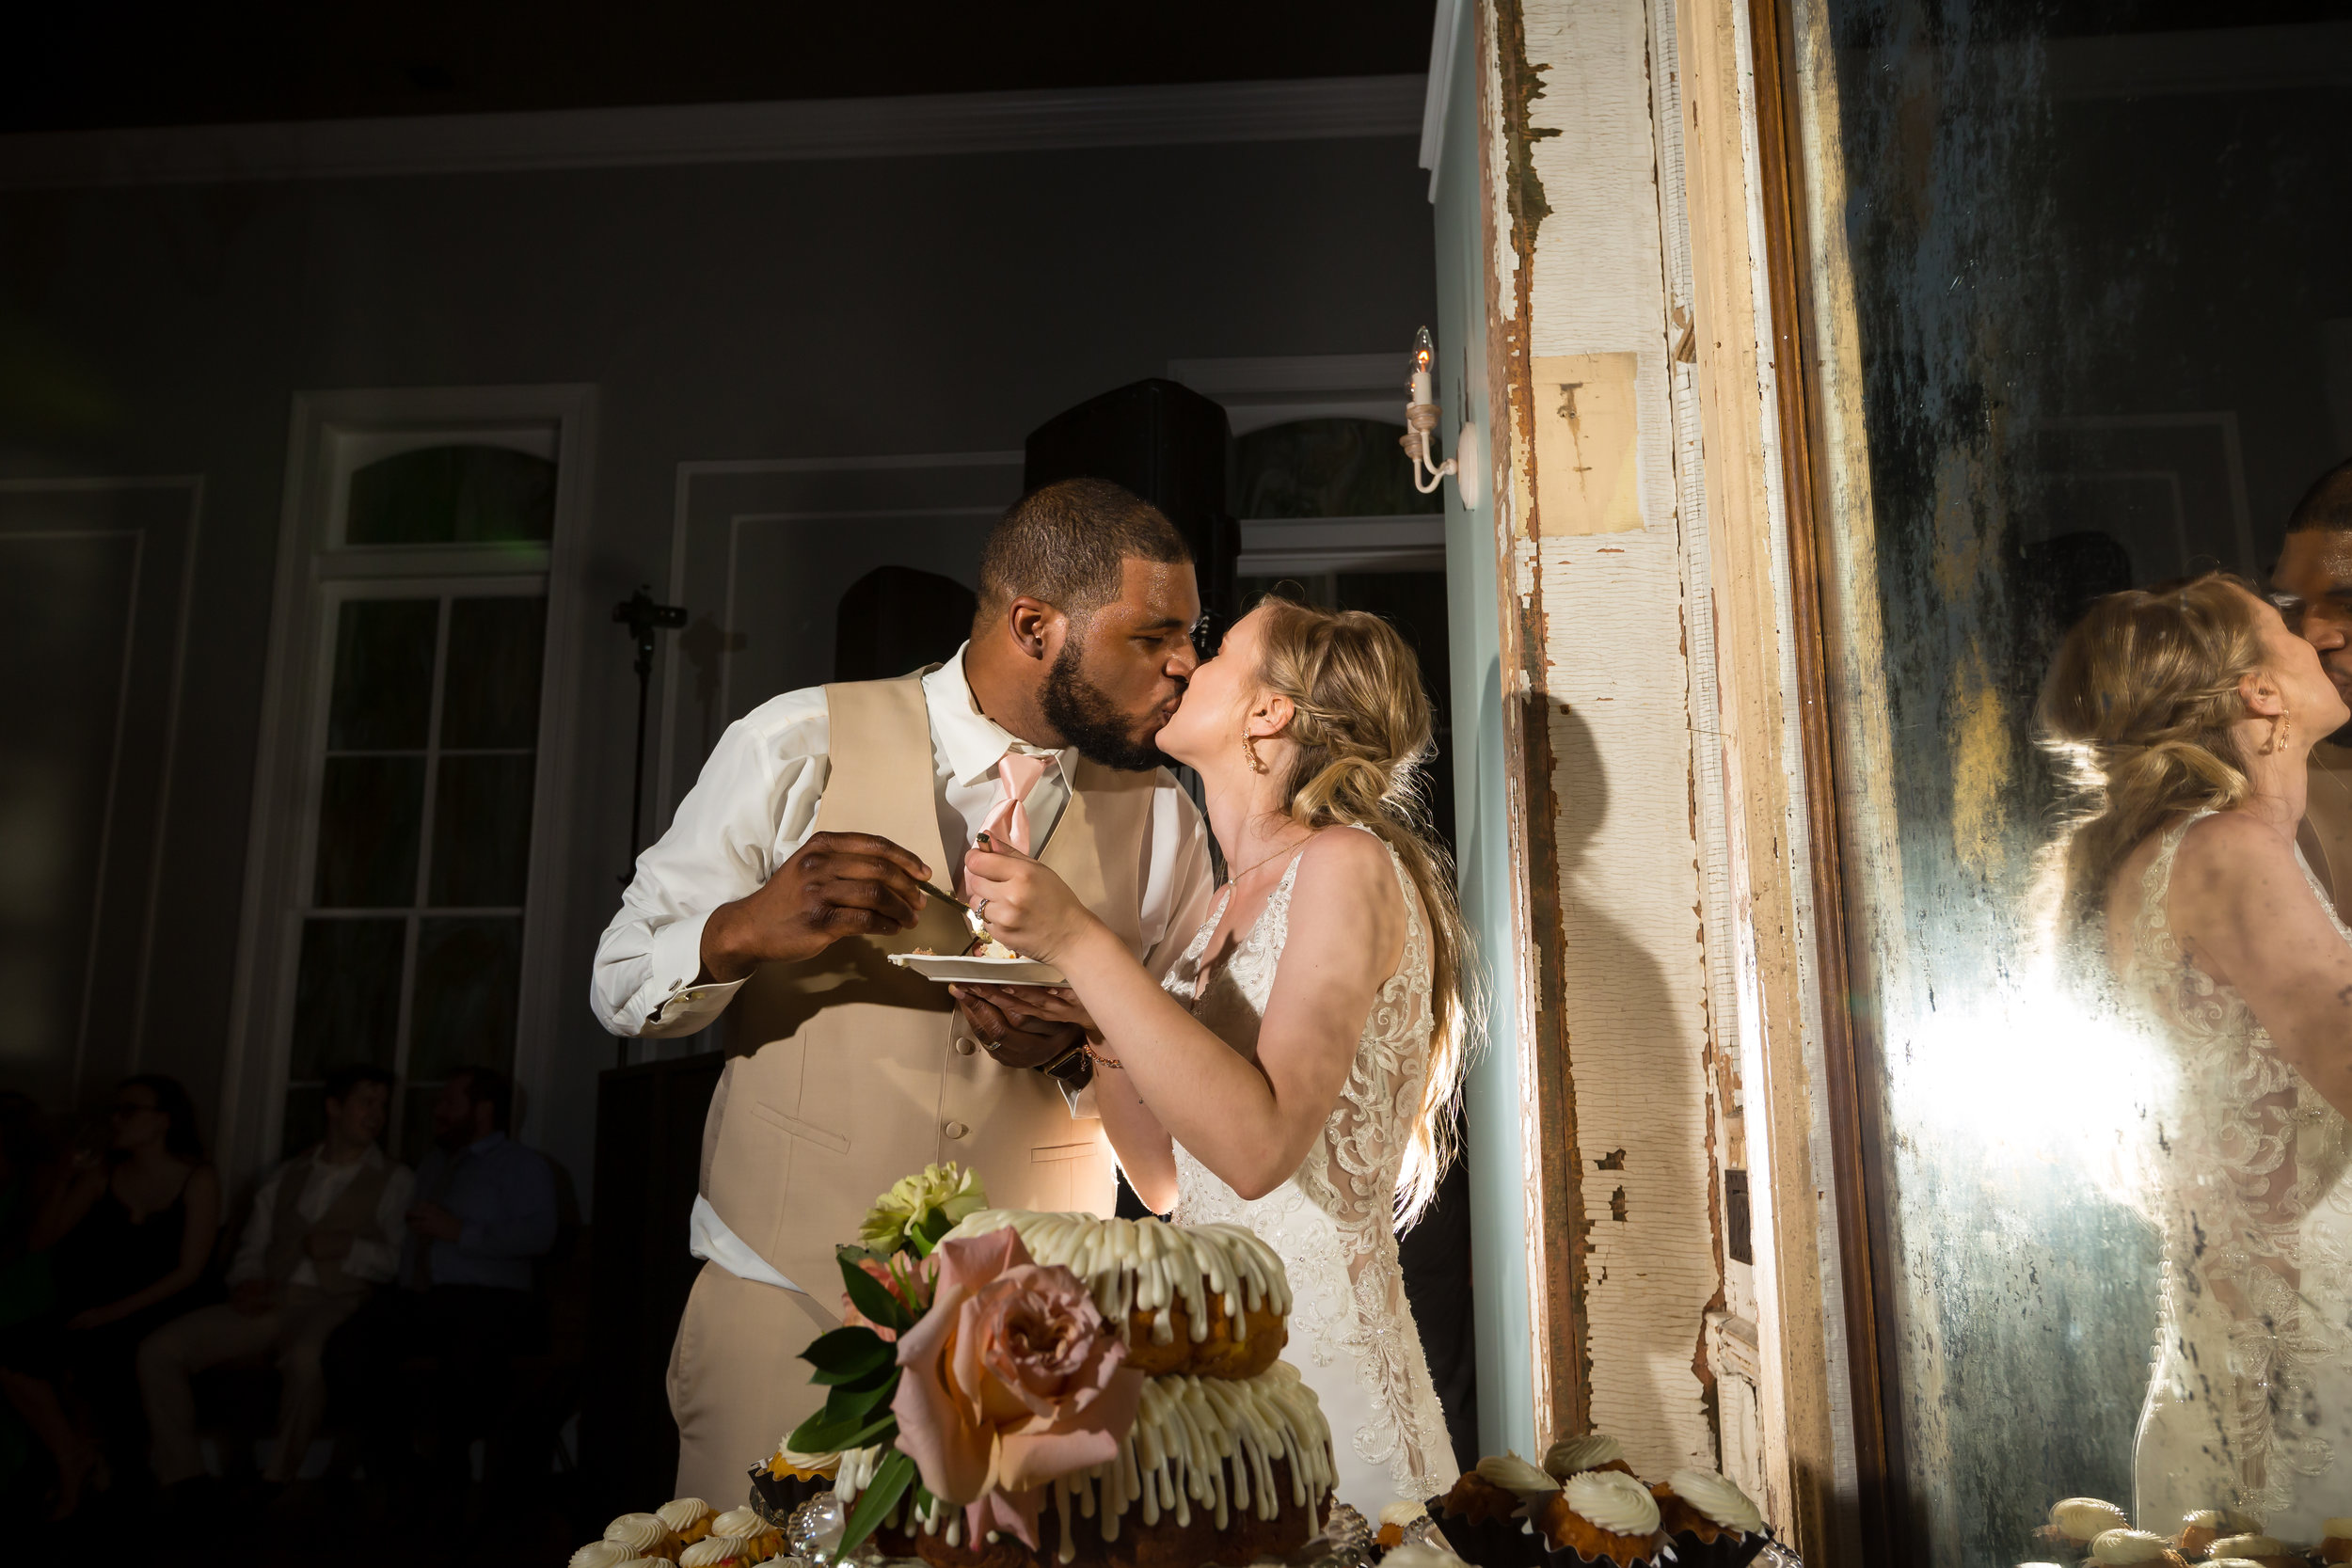 sarah_ikeem_wedding_at_the_parlour_at_manns_chapel_05.18.19-1717.jpg